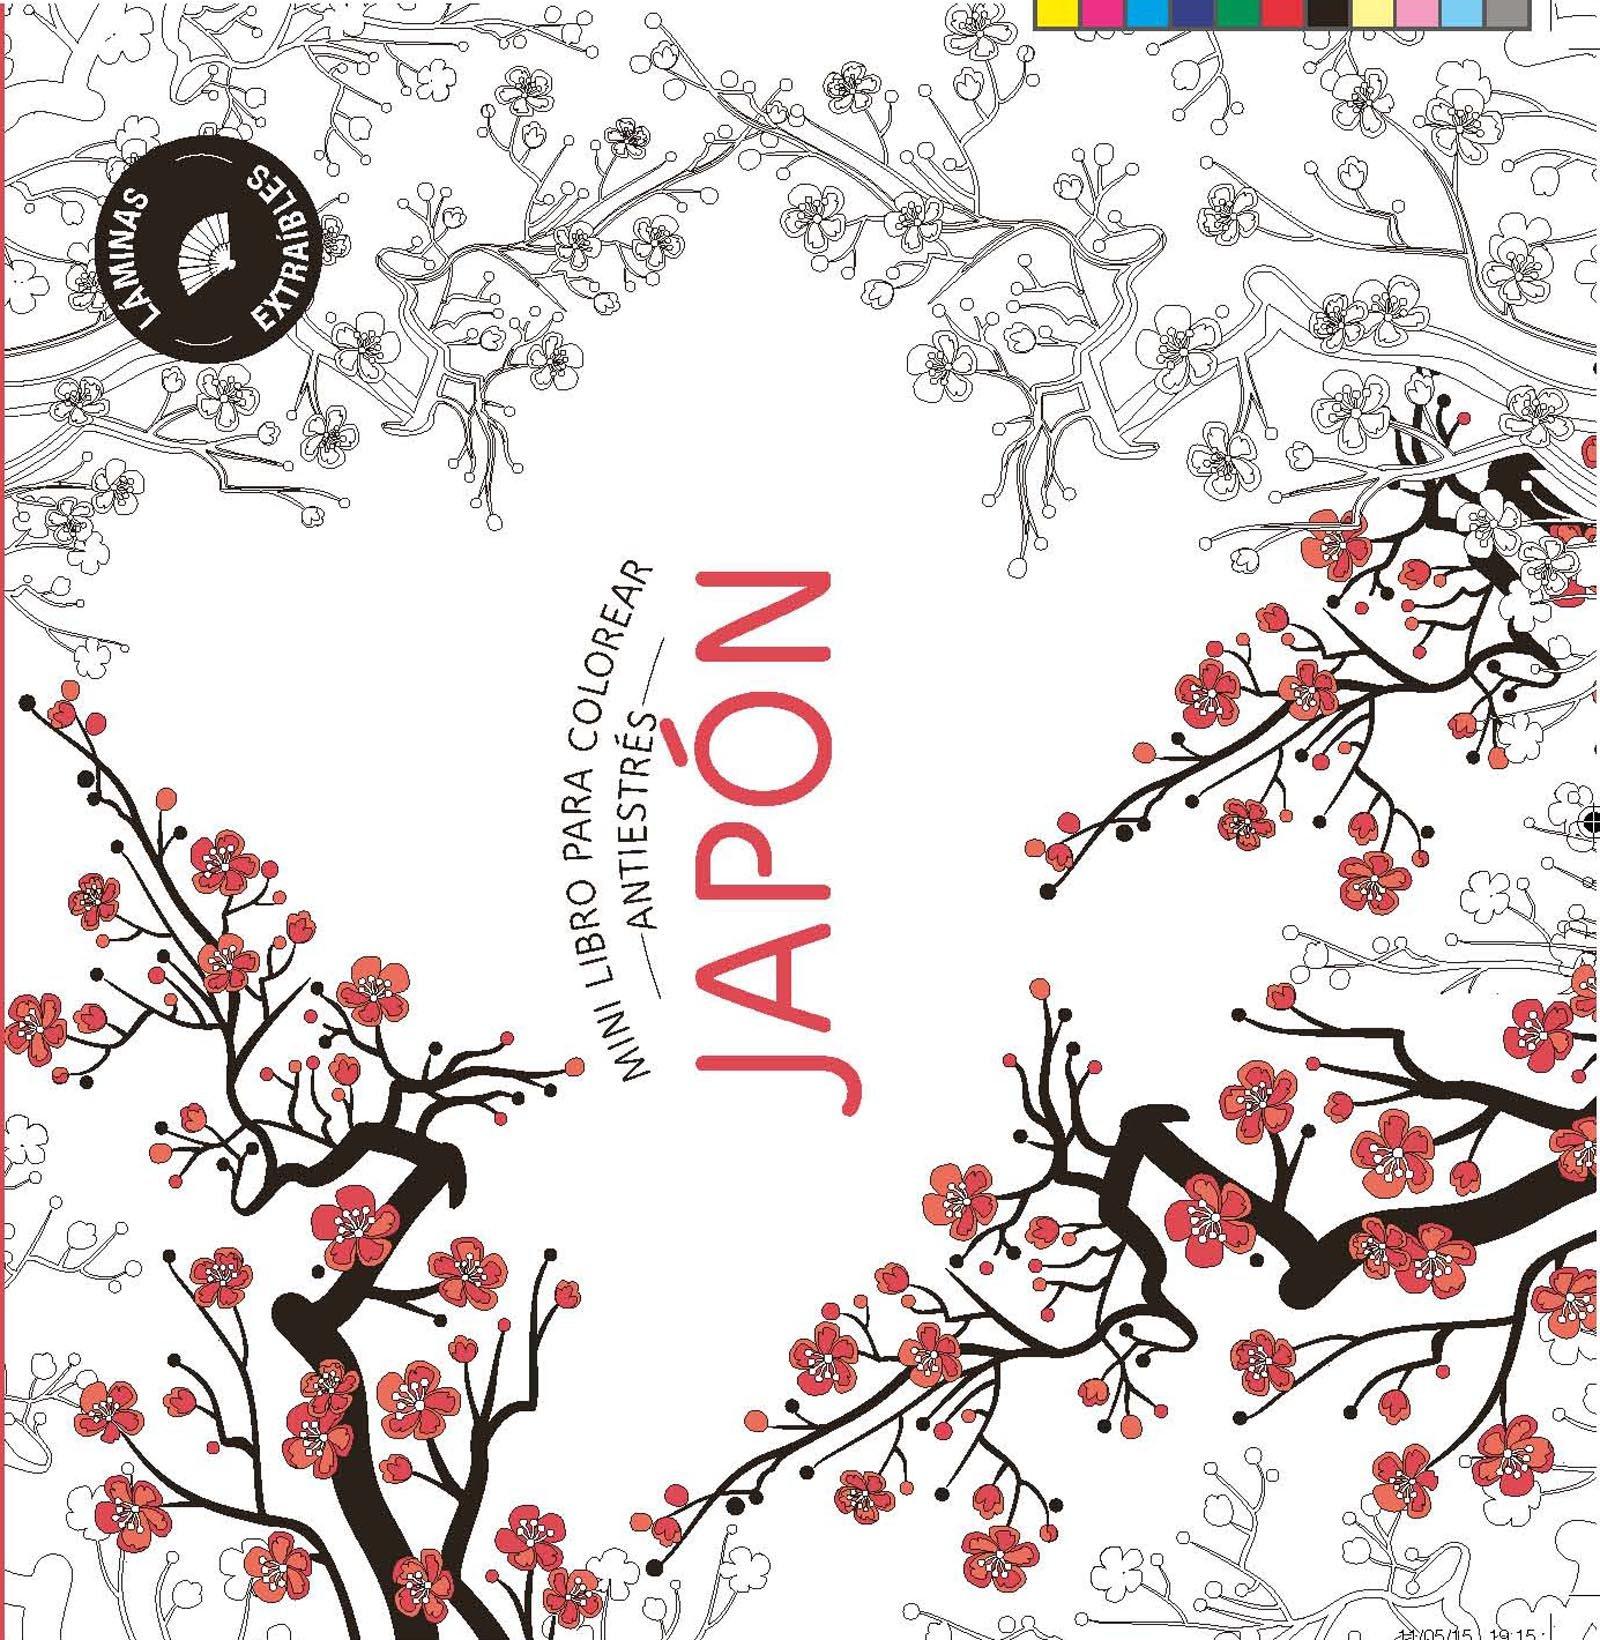 Japón. Mini libro para colorear (PRÁCTICA): Amazon.es: Redacción Marabout, Redacción Marabout: Libros